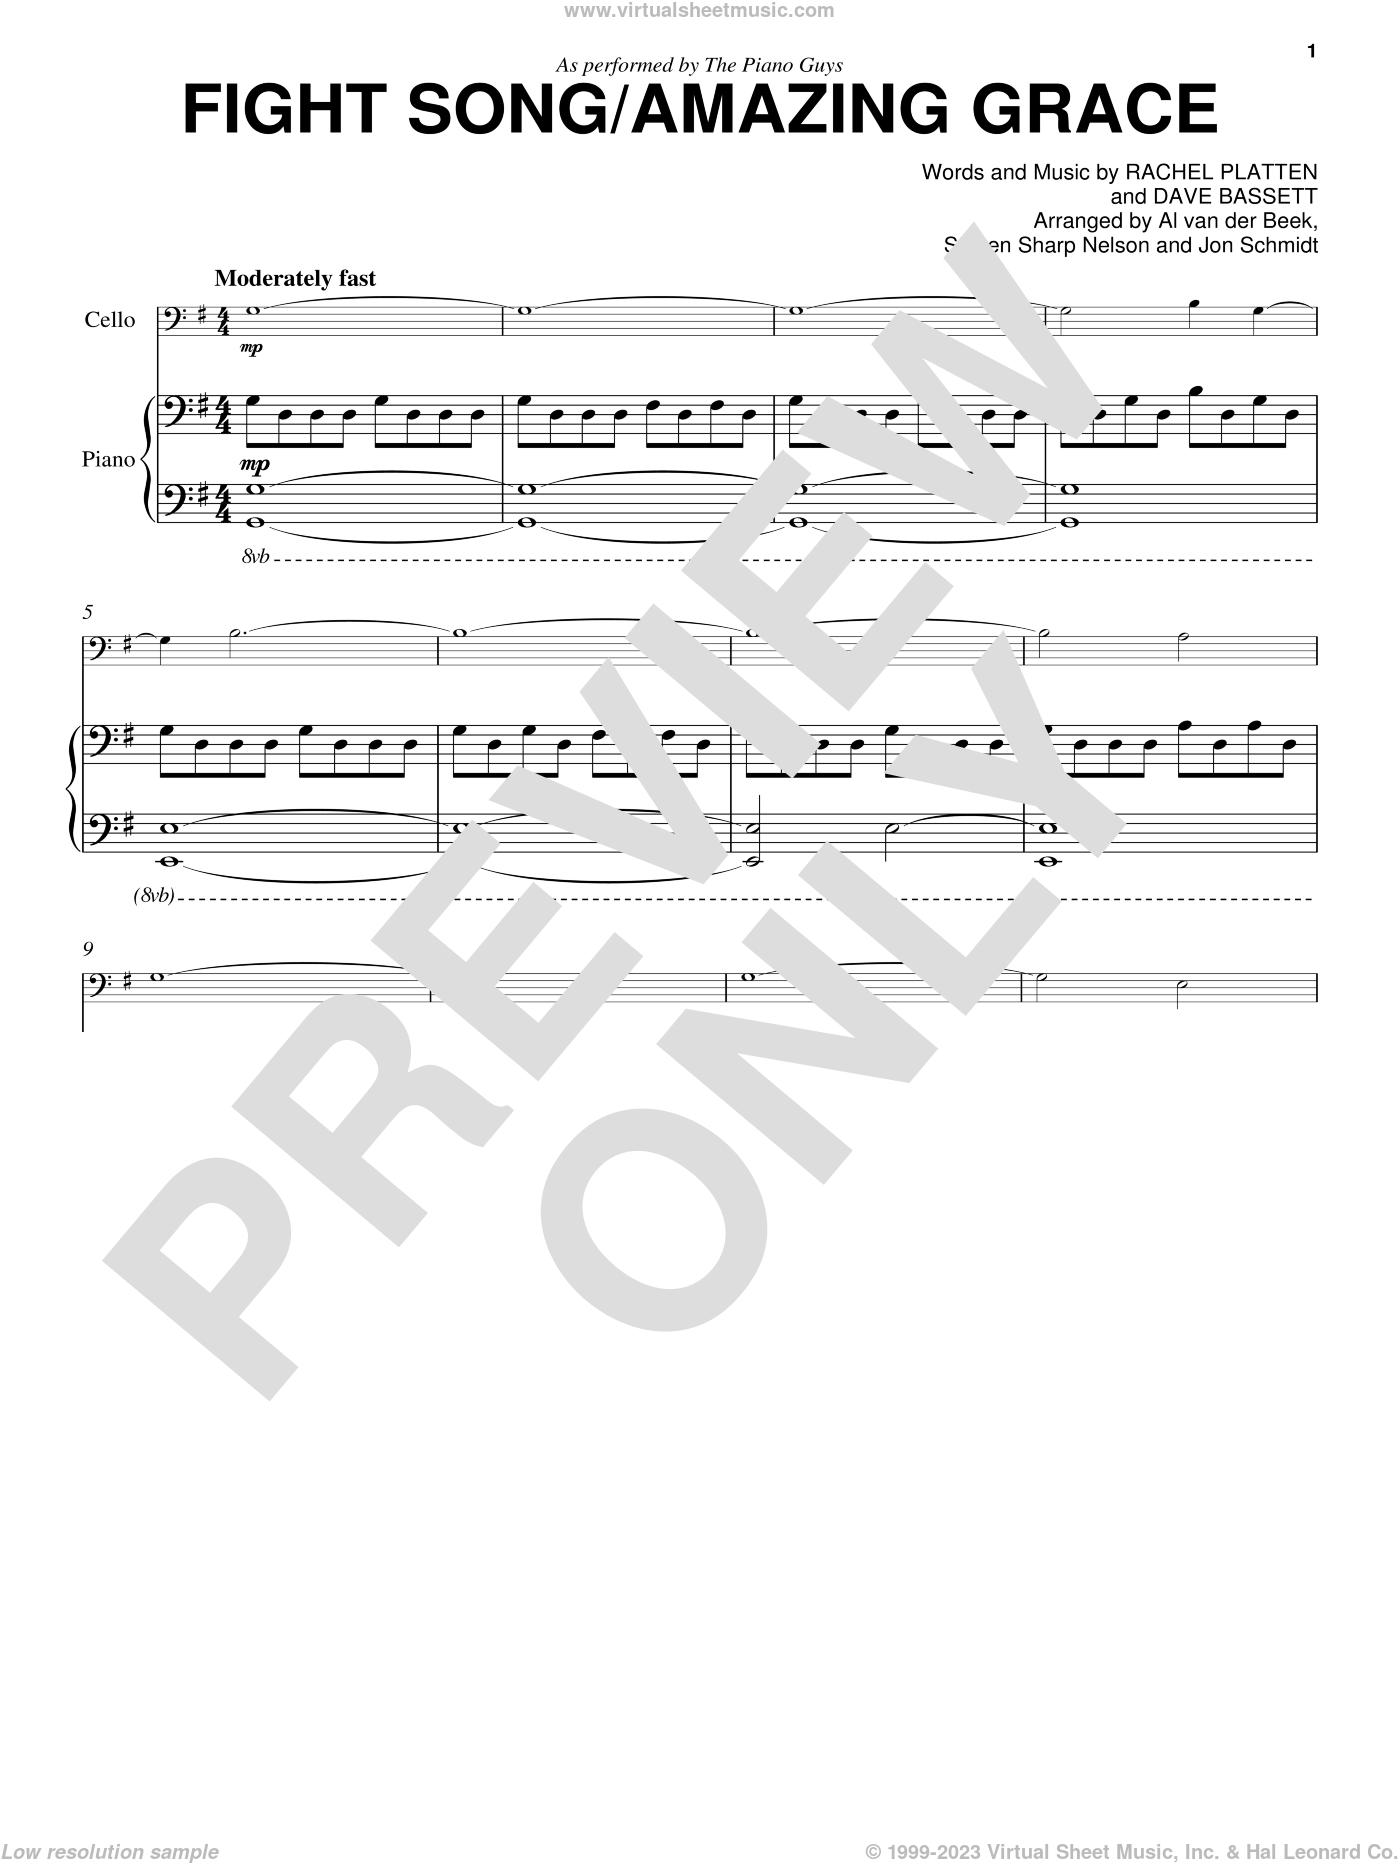 piano guys perfect ed sheeran mp3 download